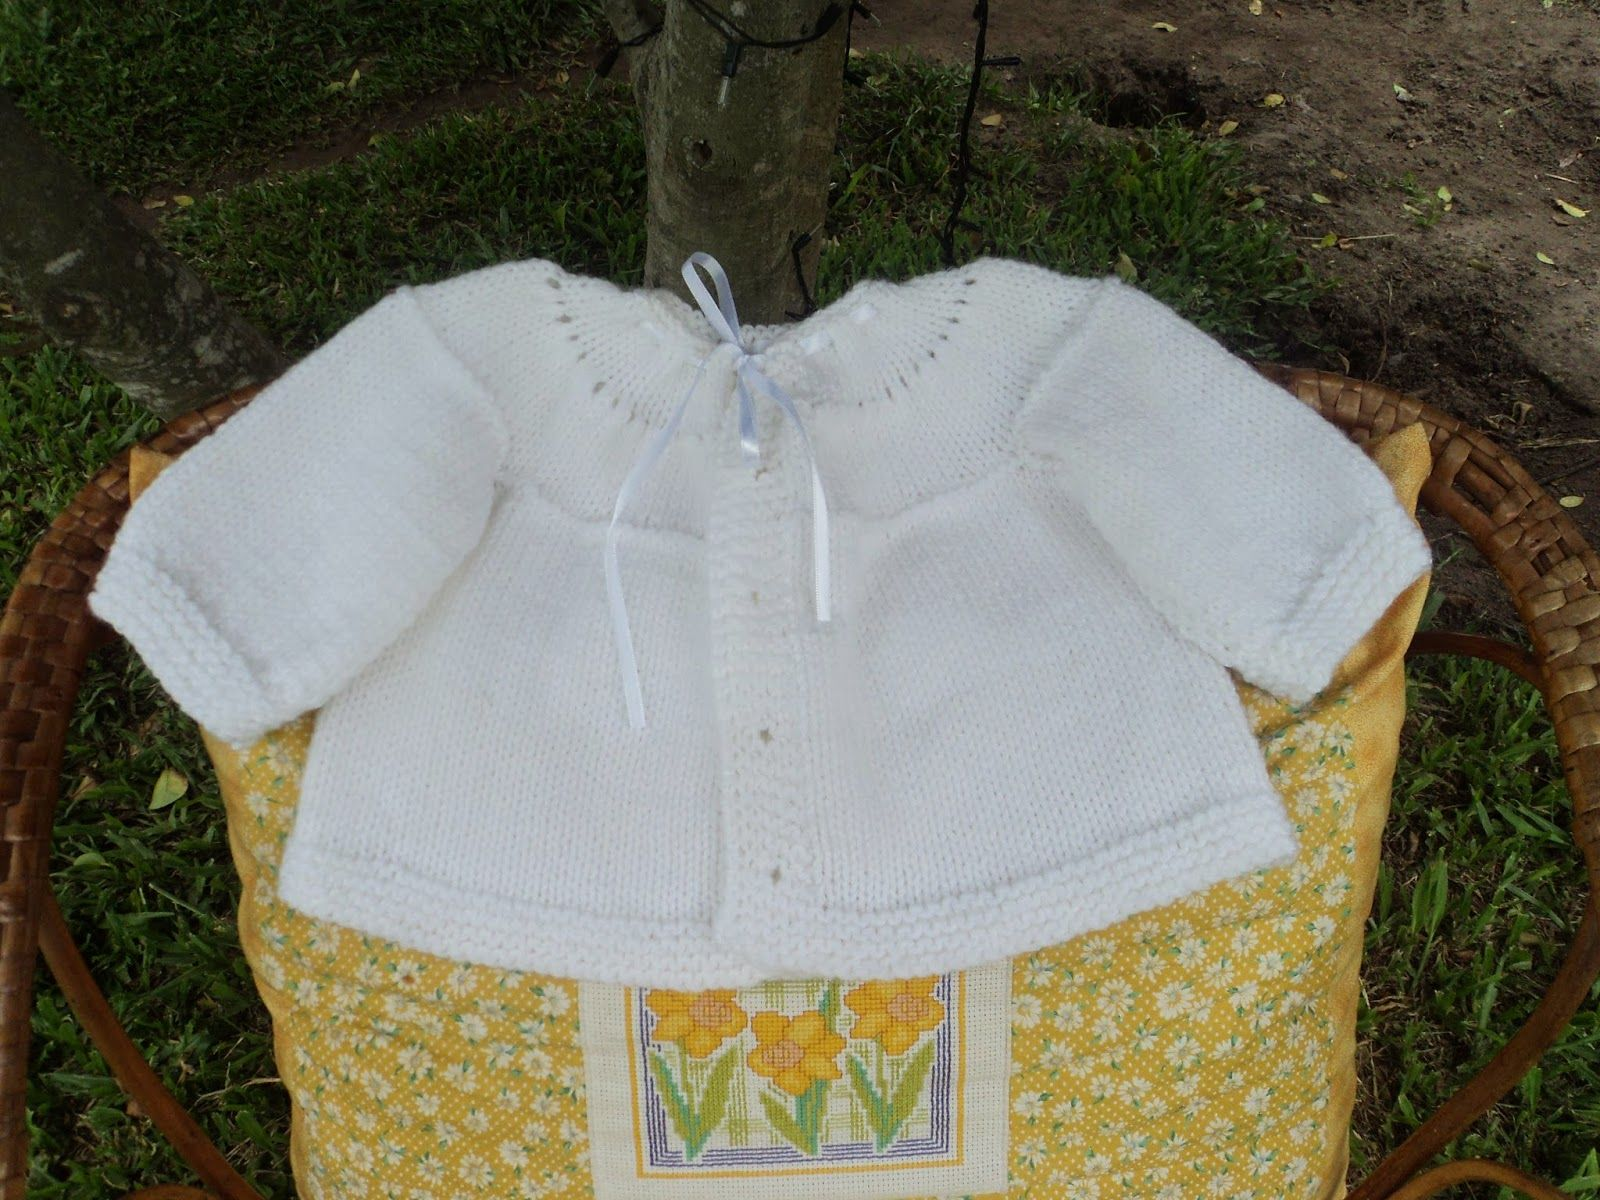 ARTES DA RITTA Casaco em tricot sem costura para bebê. | tricot ...